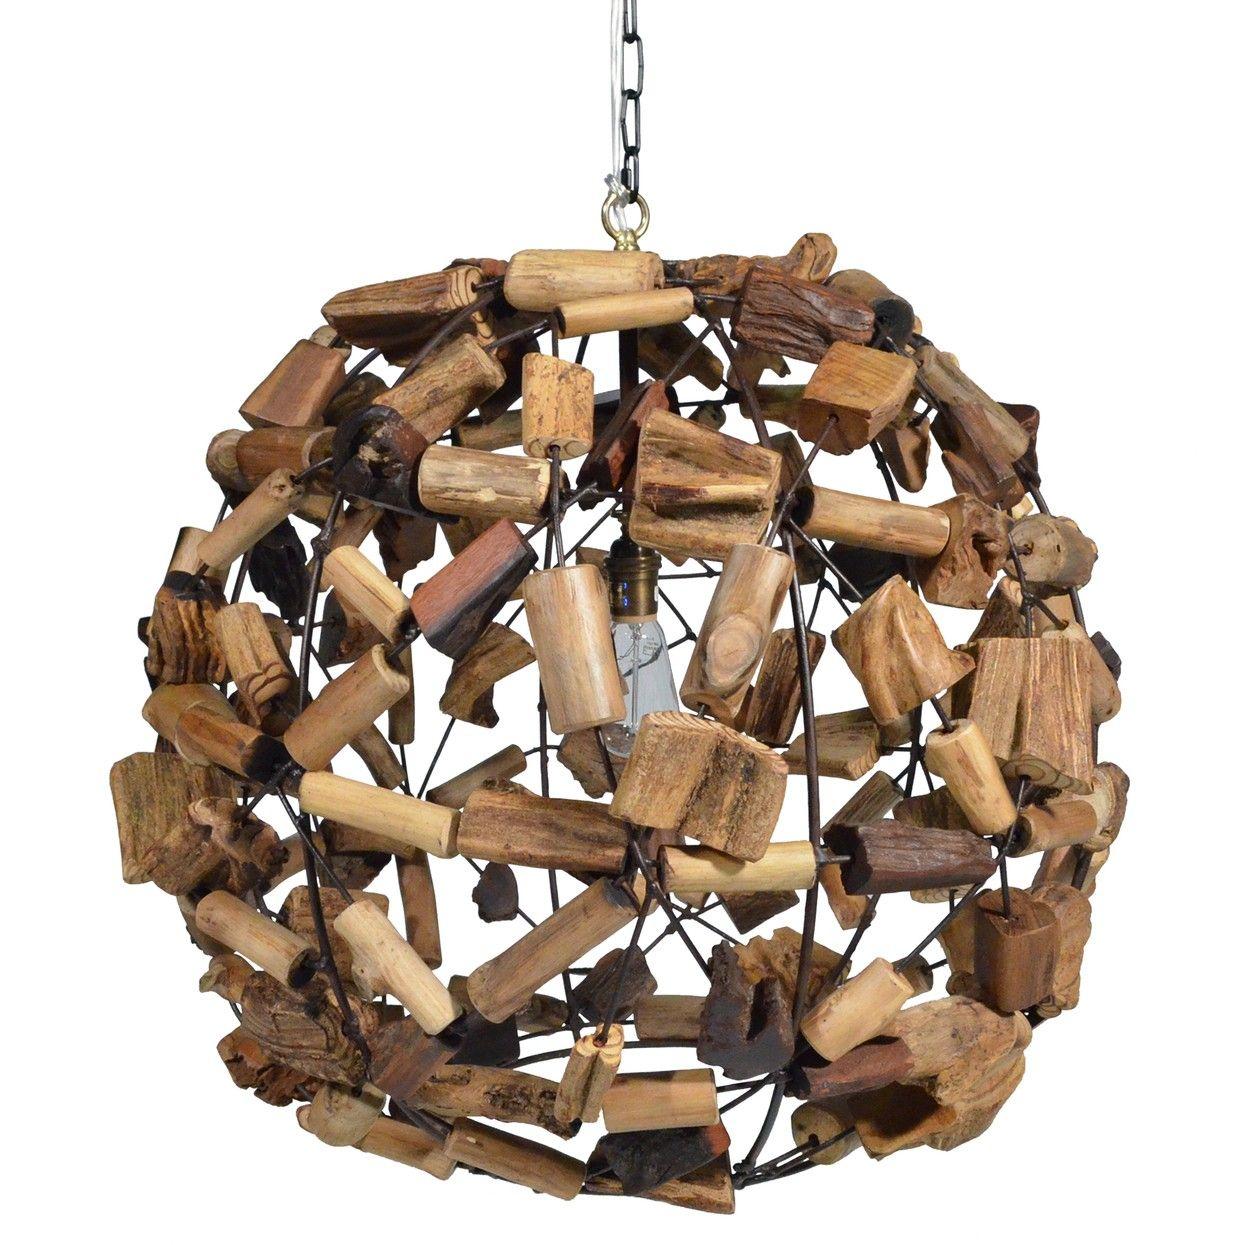 Palecek Driftwood Ball Chandelier http://www.plumgoose.com/palecek-driftwood-ball-chandelier.html